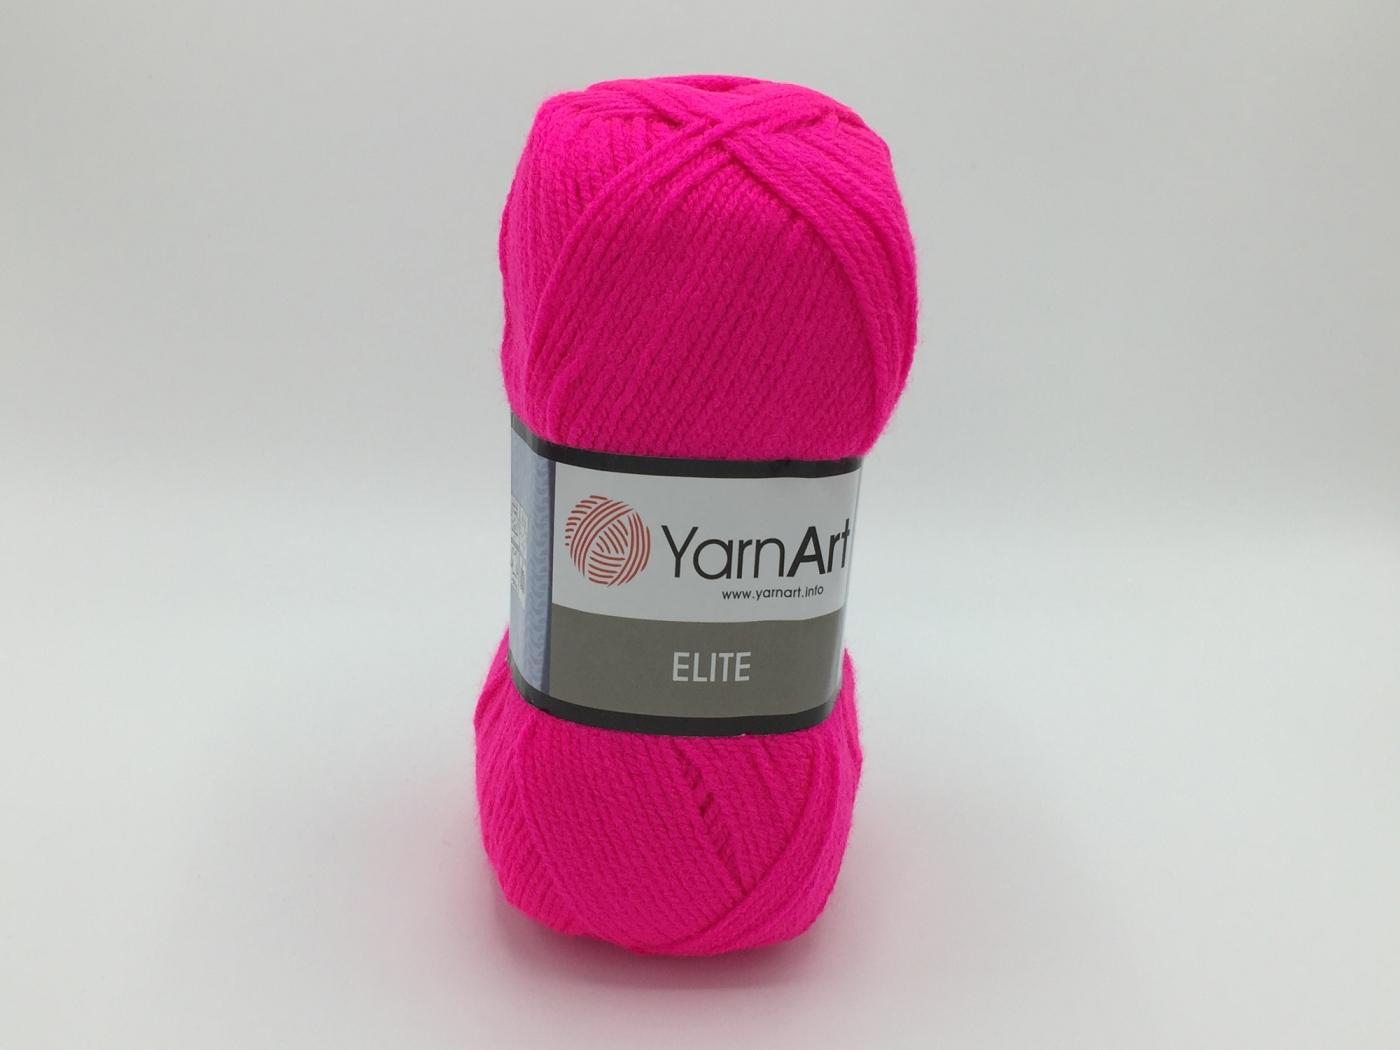 Fire tricotat - ELITE - Ticlam - 174 - Yarn-Art